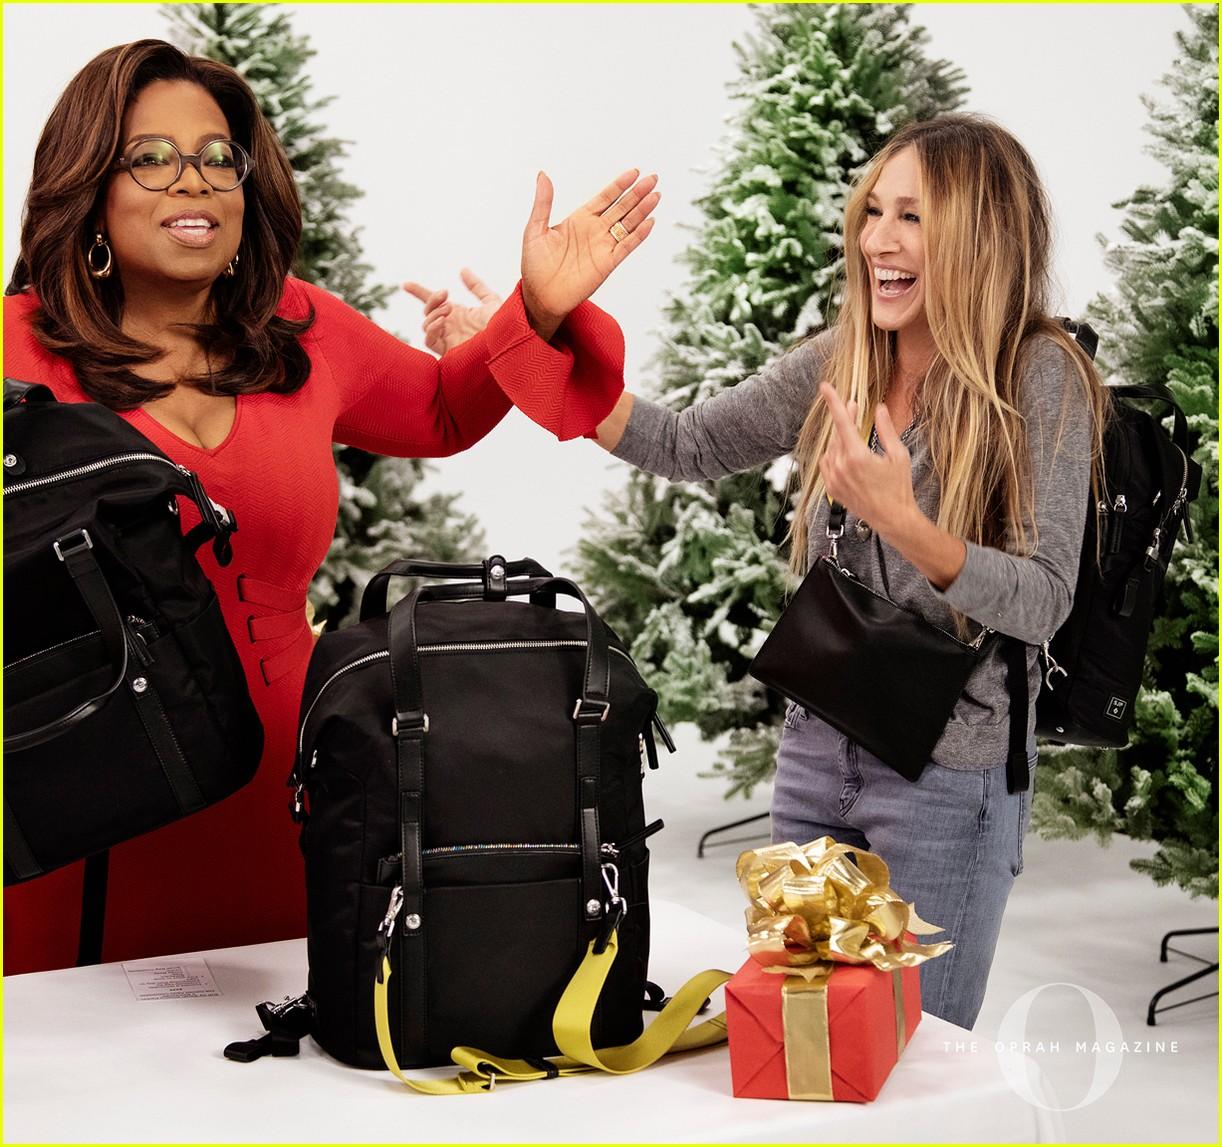 oprah's favorite things 2019 - photo #4